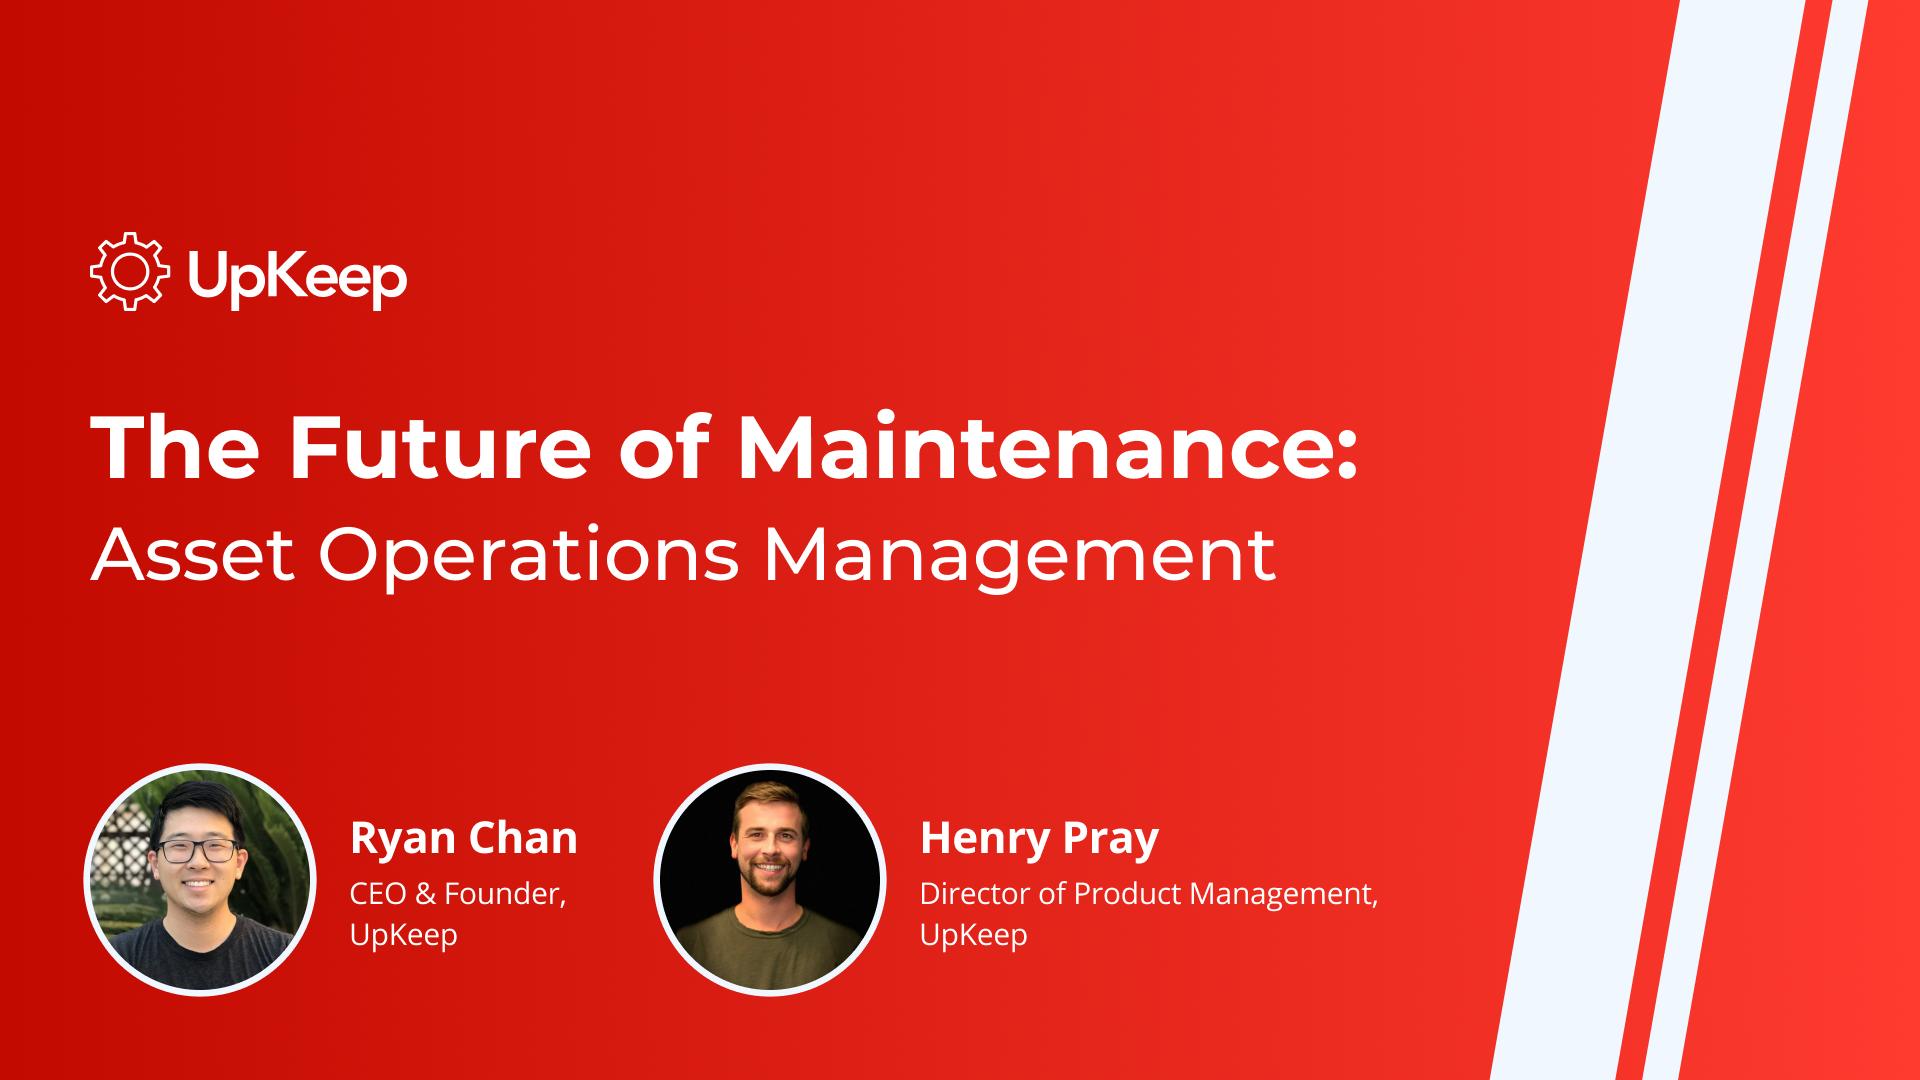 The Future of Maintenance: Asset Operations Management